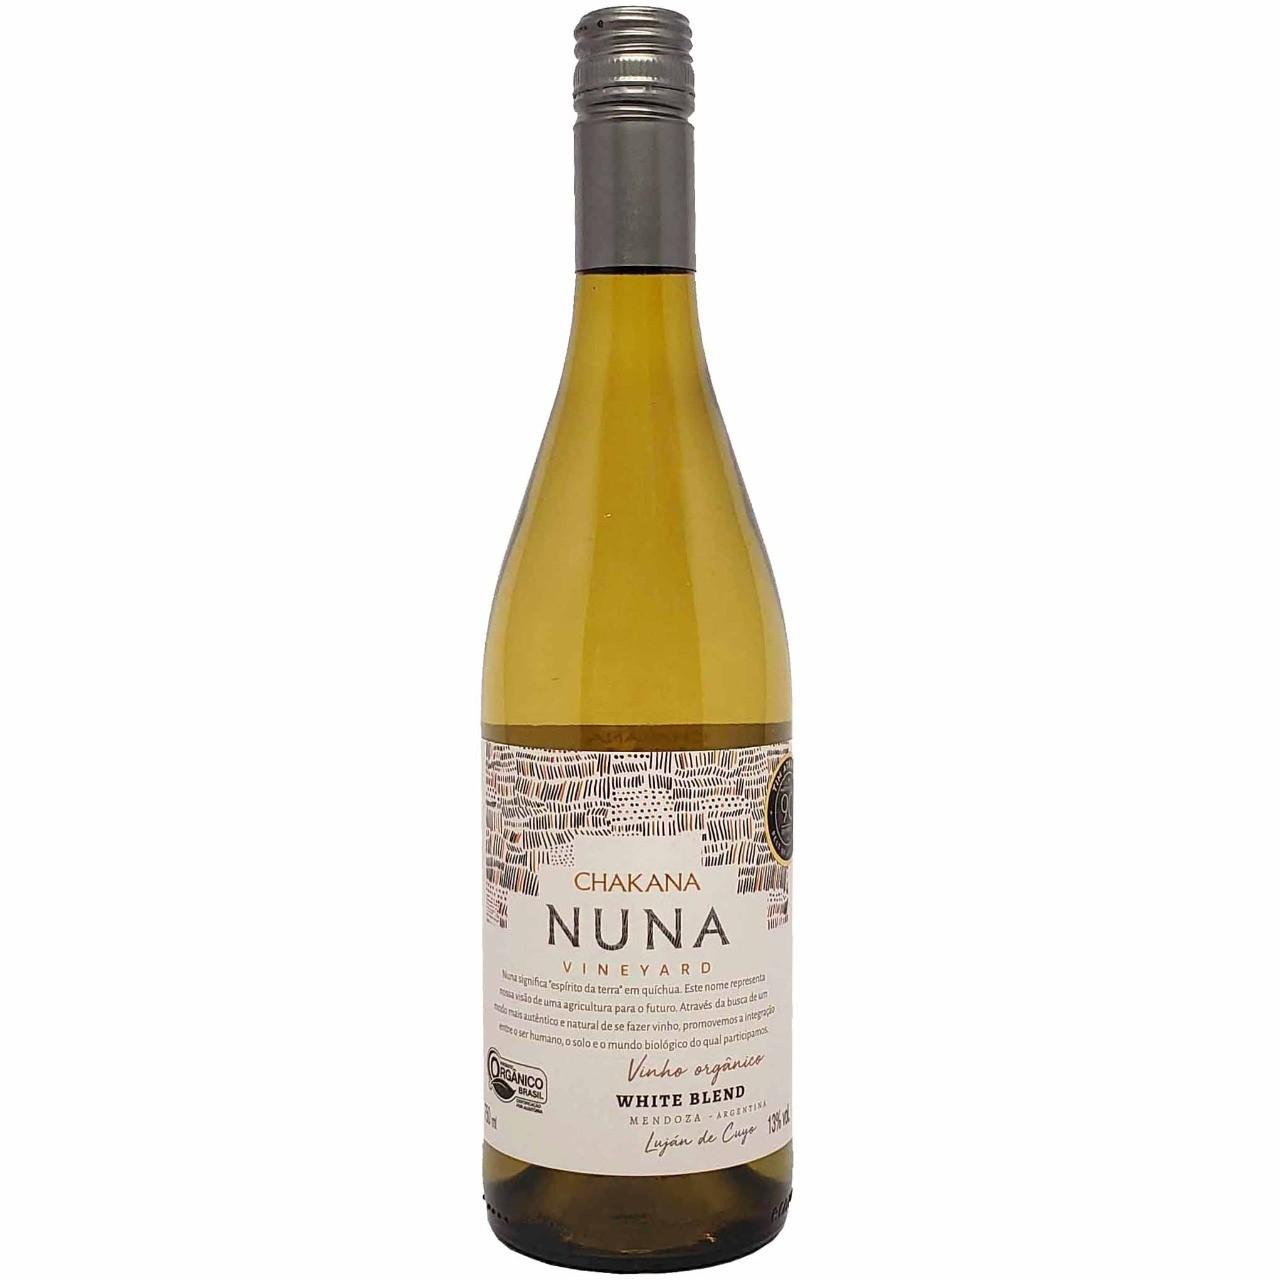 Vinho Branco Orgânico Chakana Nuna Vineyard White Blend - 750ml -